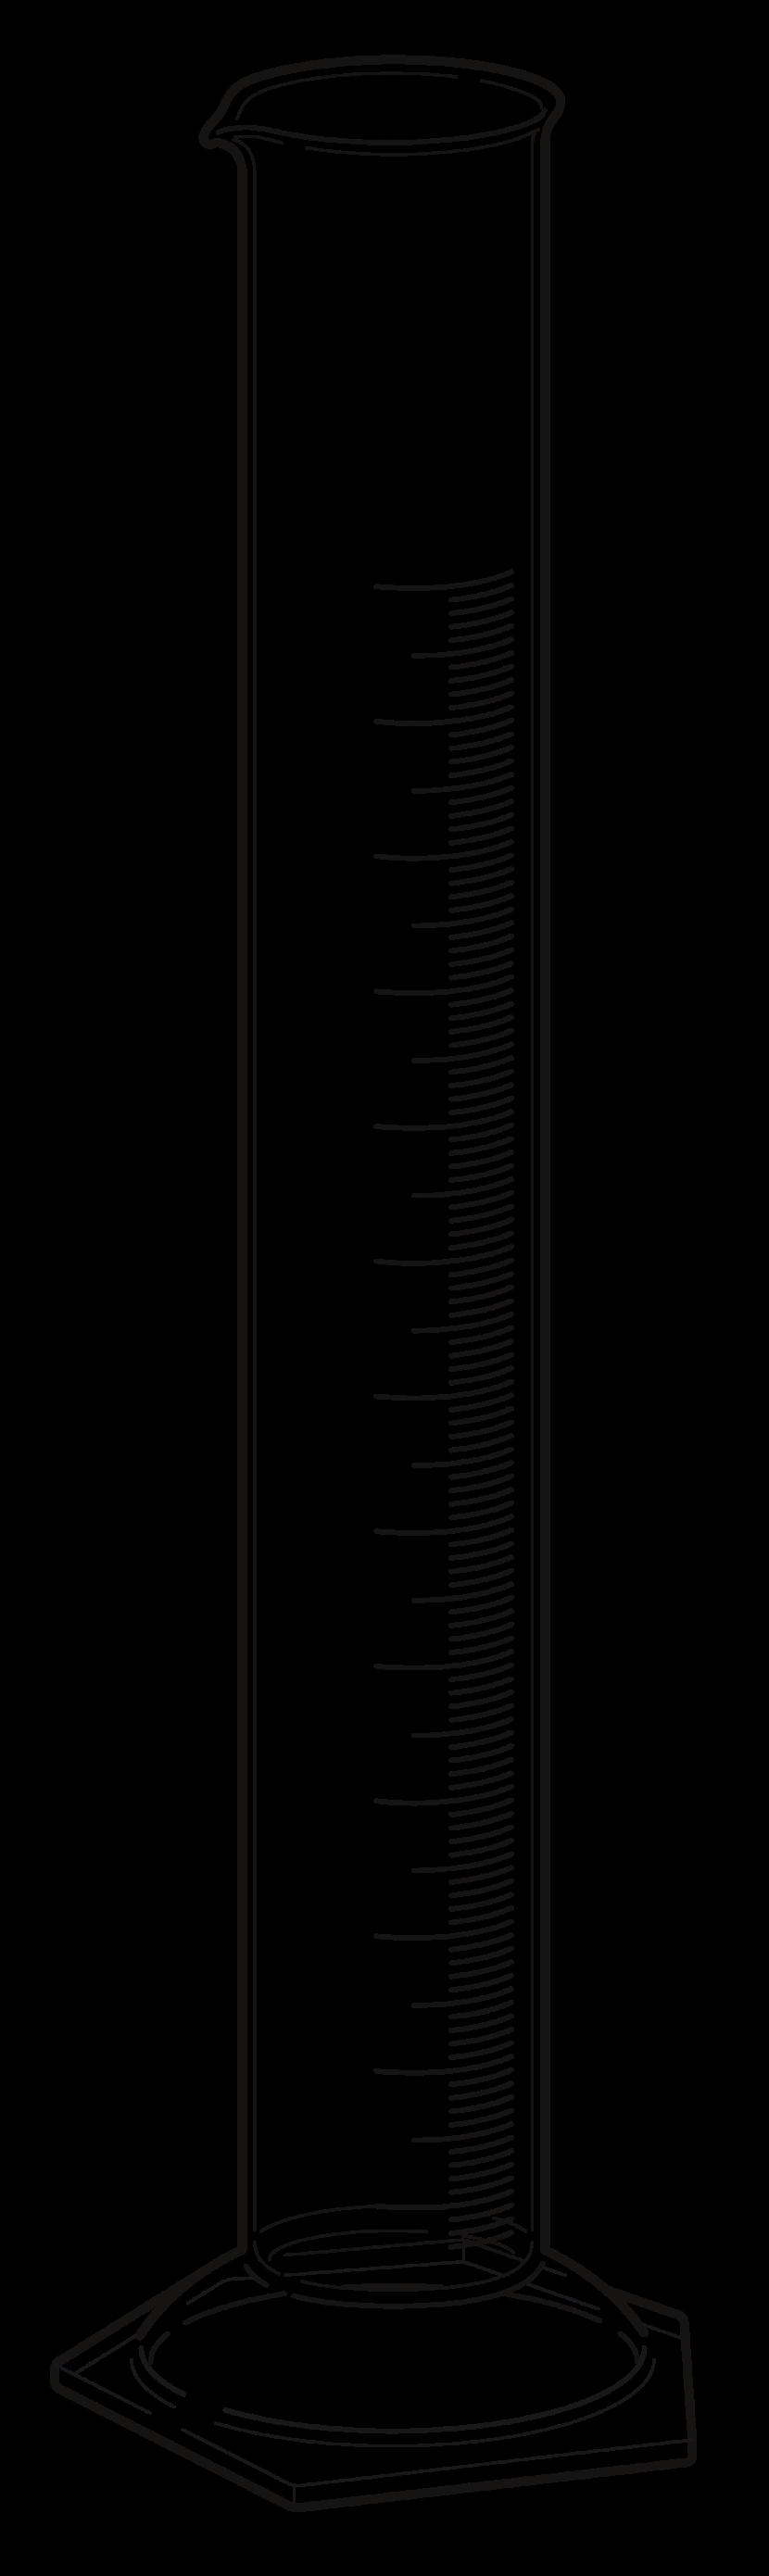 Graduated Cylinder Clip Art U0026middot;-Graduated Cylinder Clip Art u0026middot; File Graduatedcylinder Wikimedia Commons-9